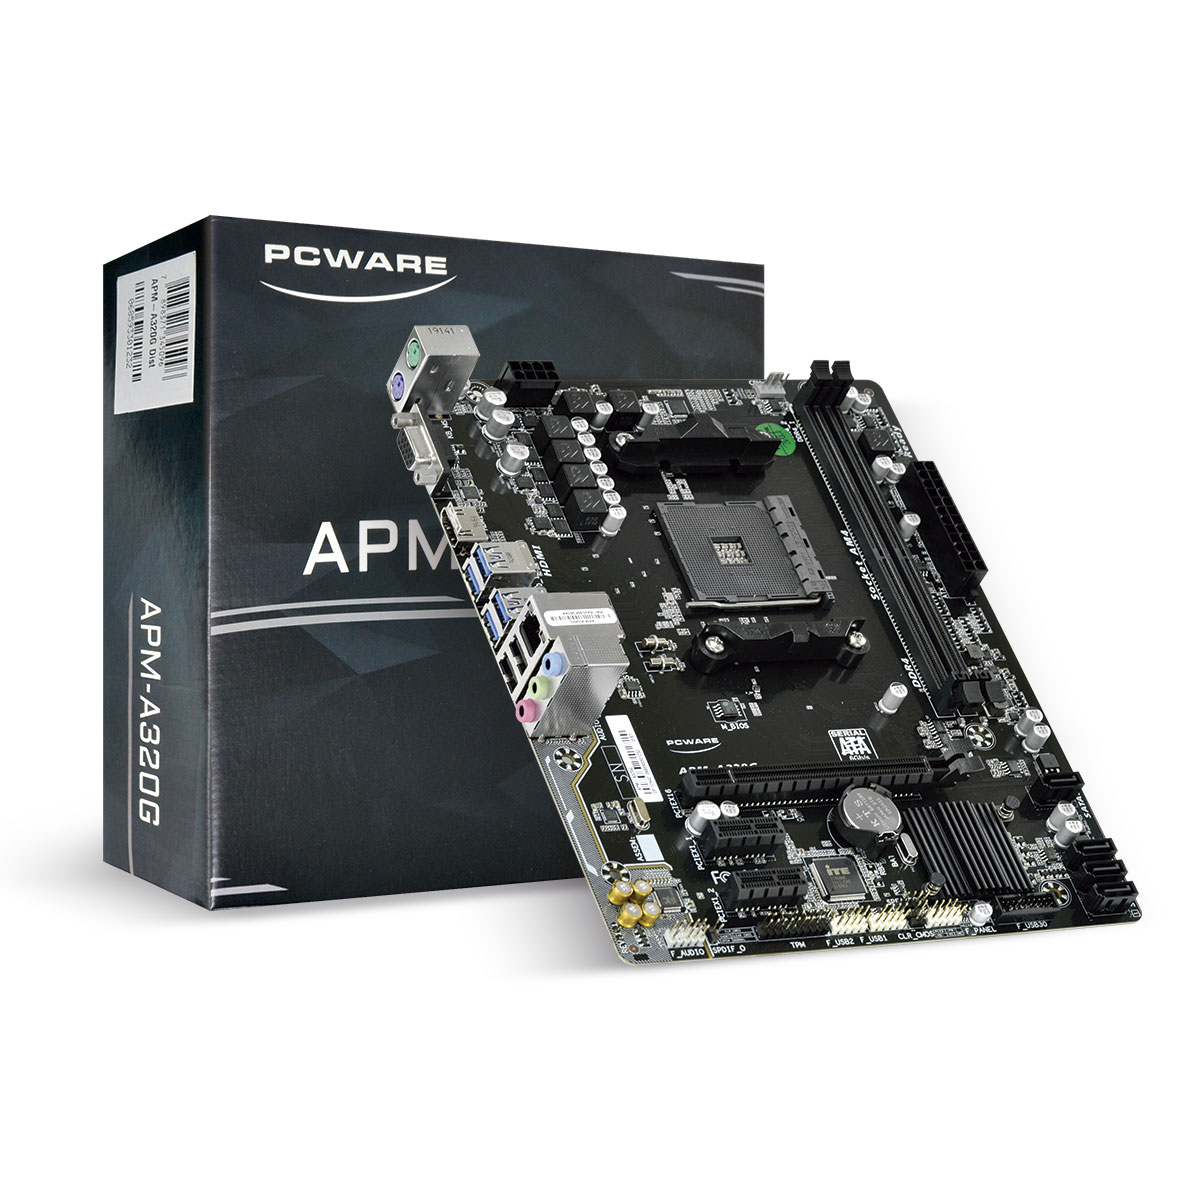 Placa Mãe Pcware P/ AMD Ryzen Matx APM-A320G, 2XDDR4 32GB, HDMI, VGA, 2X Pcie, 1XPCI X16, USB 3.0